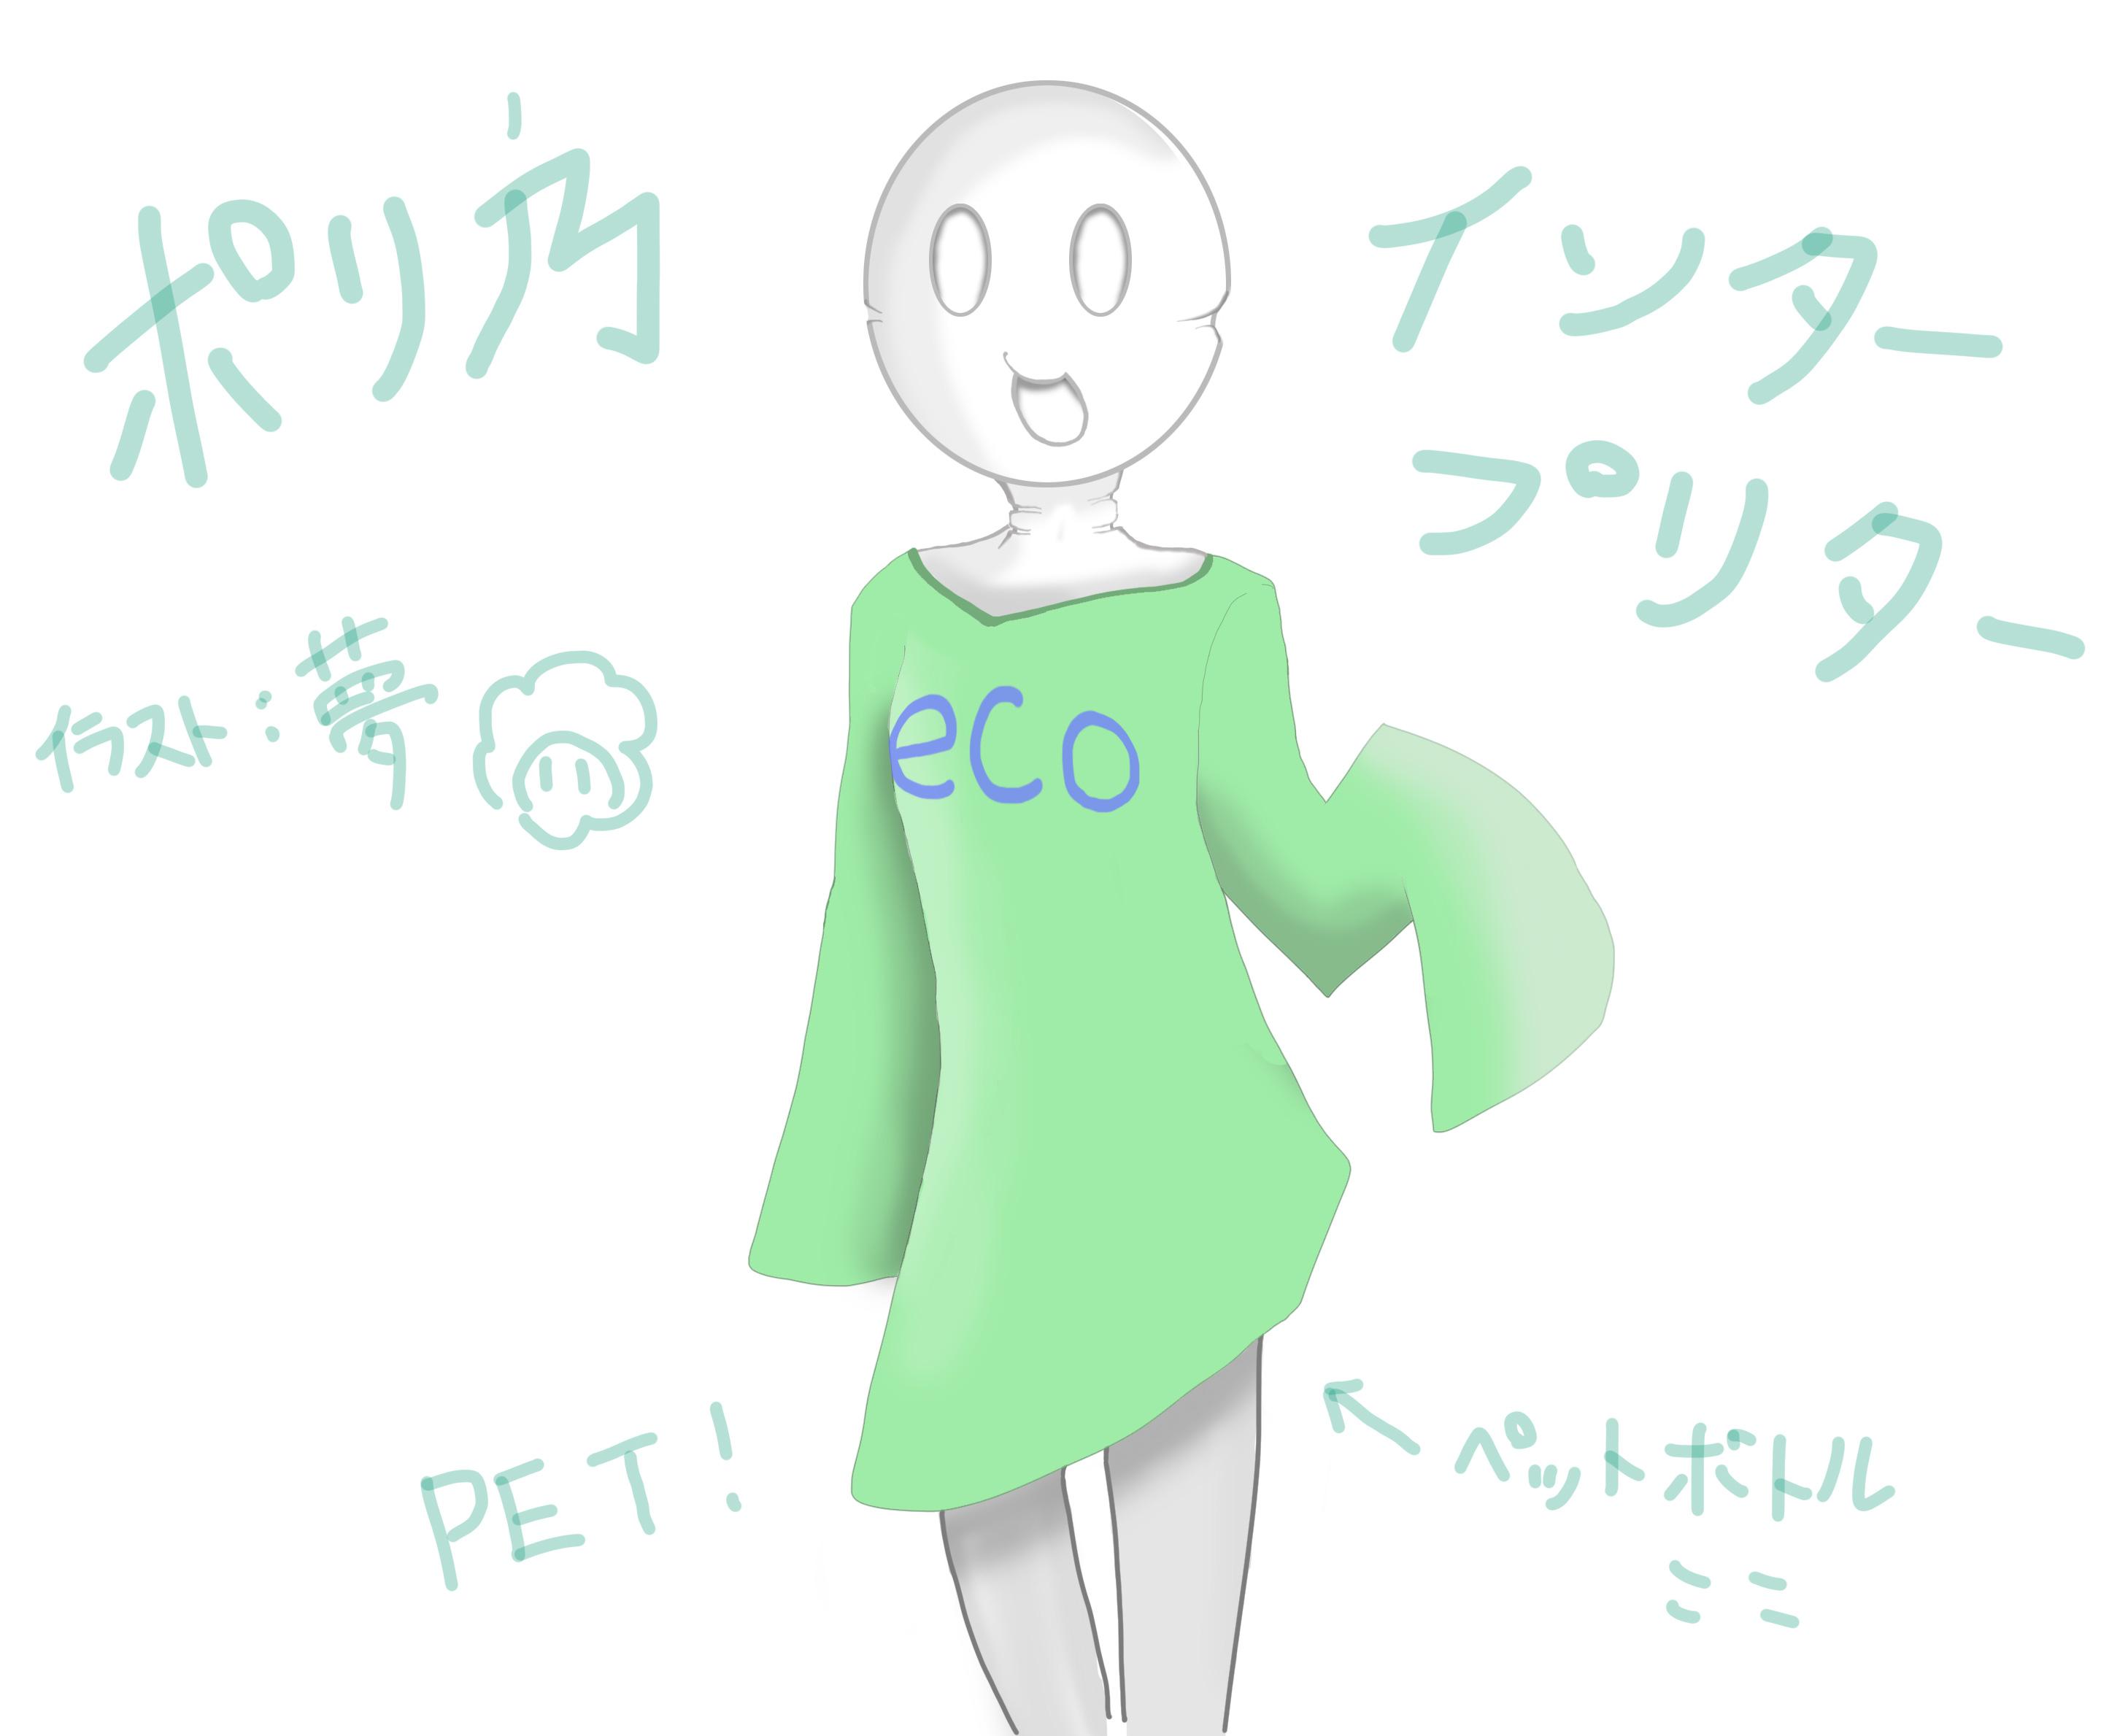 pet1.jpg